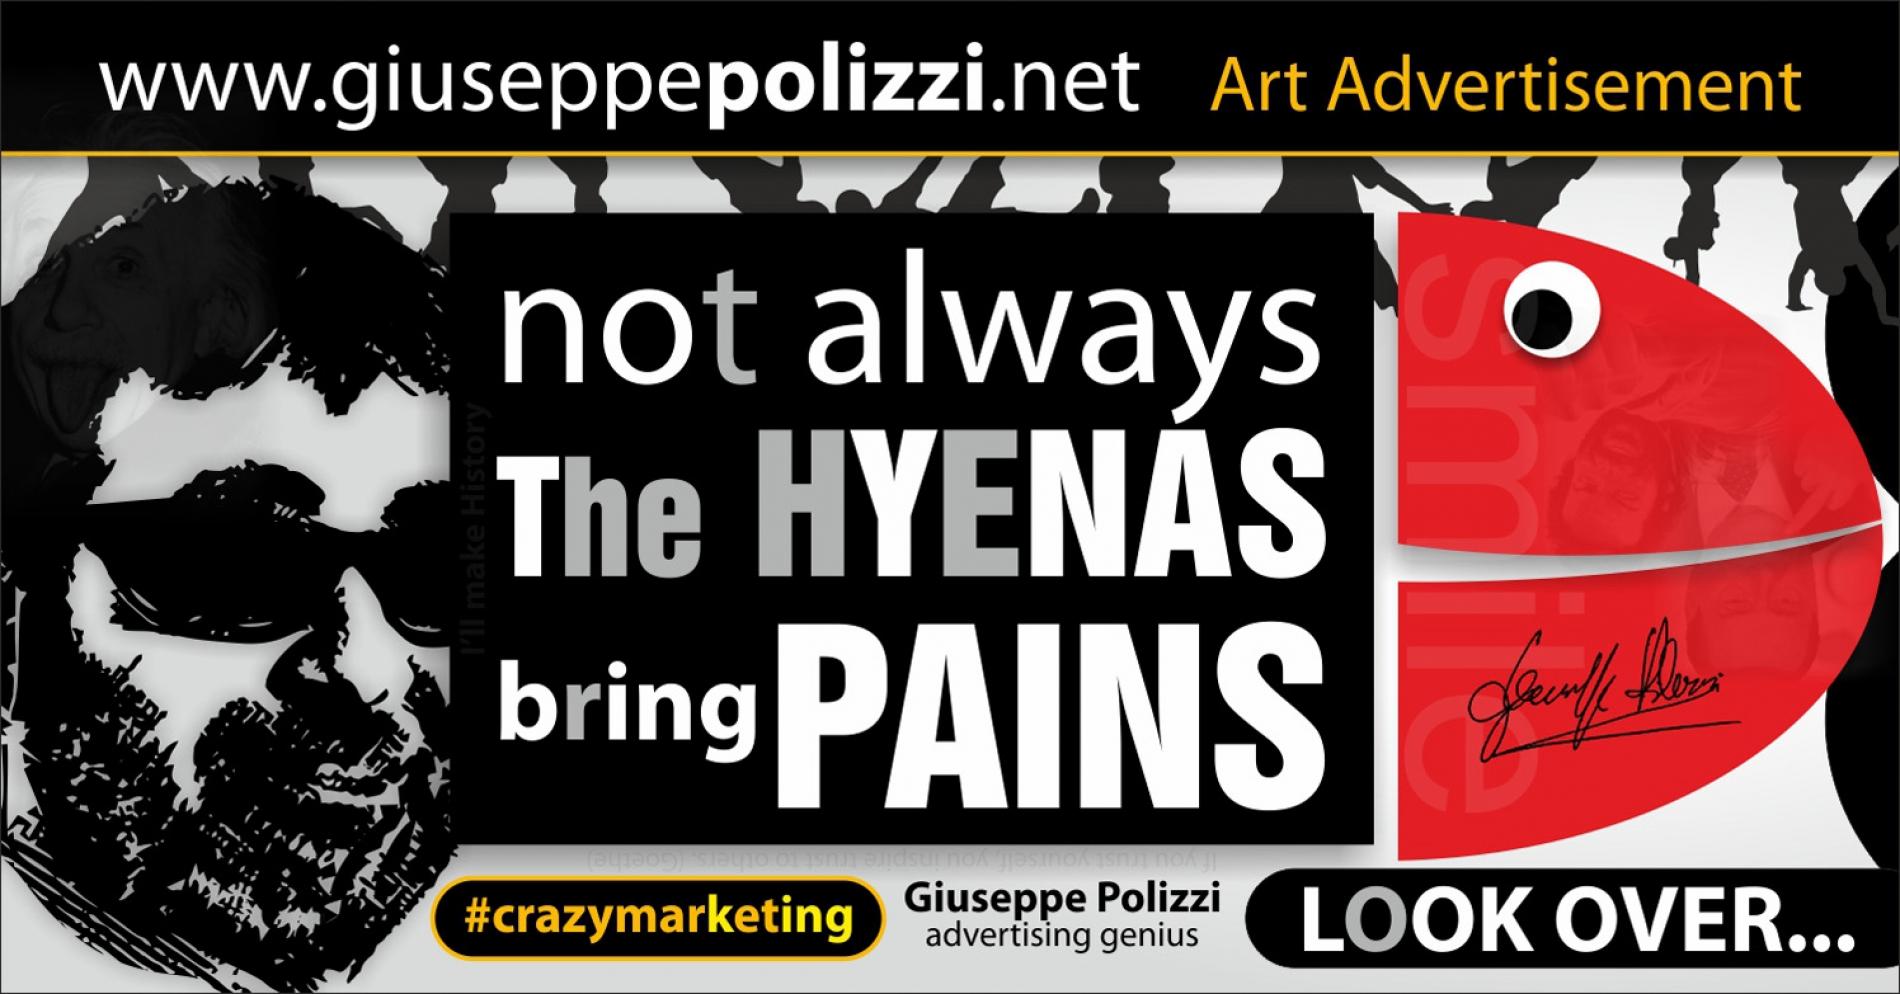 giuseppe polizzi aforismi IENE 2016 crazy marketing inglese